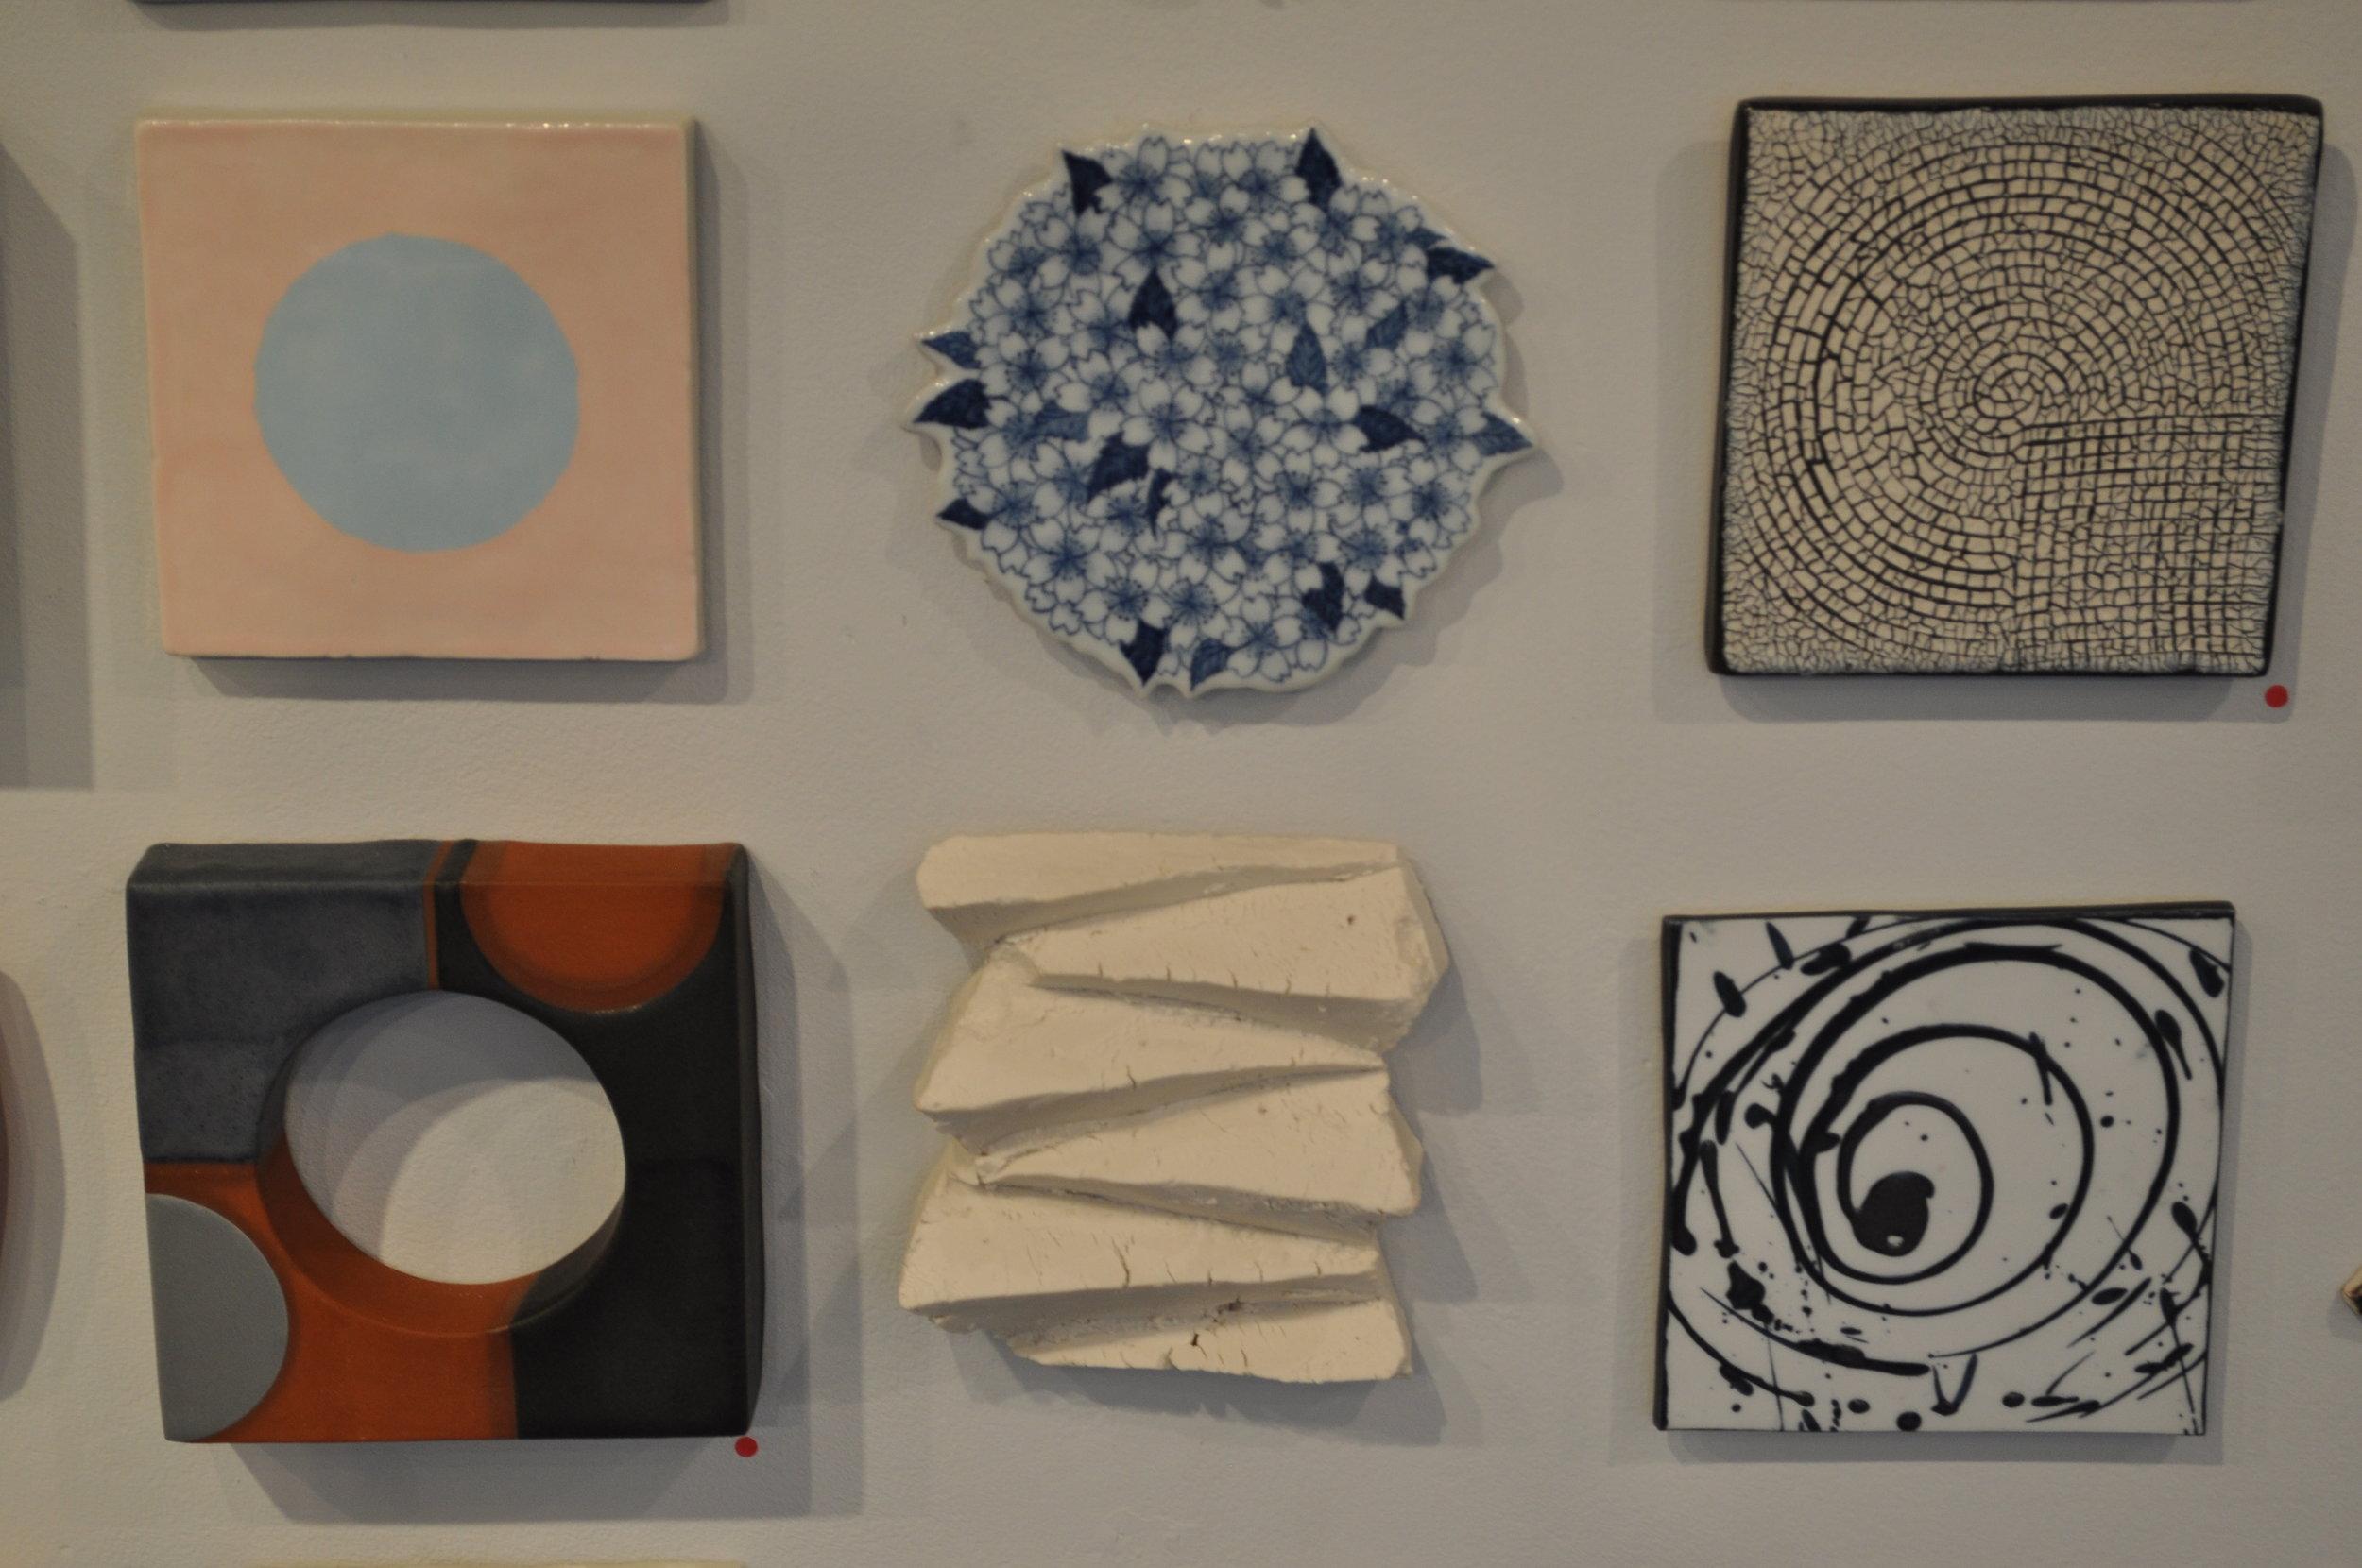 1.  Ron Geibel,  Blue on Pink  $150  2 . Hatsumi Suyama,  Flower tile 3 $80  3 . Richard Burkett,  Circle/square  (SOLD)  4. Logan Wall,  Wall Tile #2  (SOLD) 5.  Clementine Porcelain,  Cut 6x5 (Jesse Ross) $100  6.  Reena Kashyap,  Splashed Circle  $50